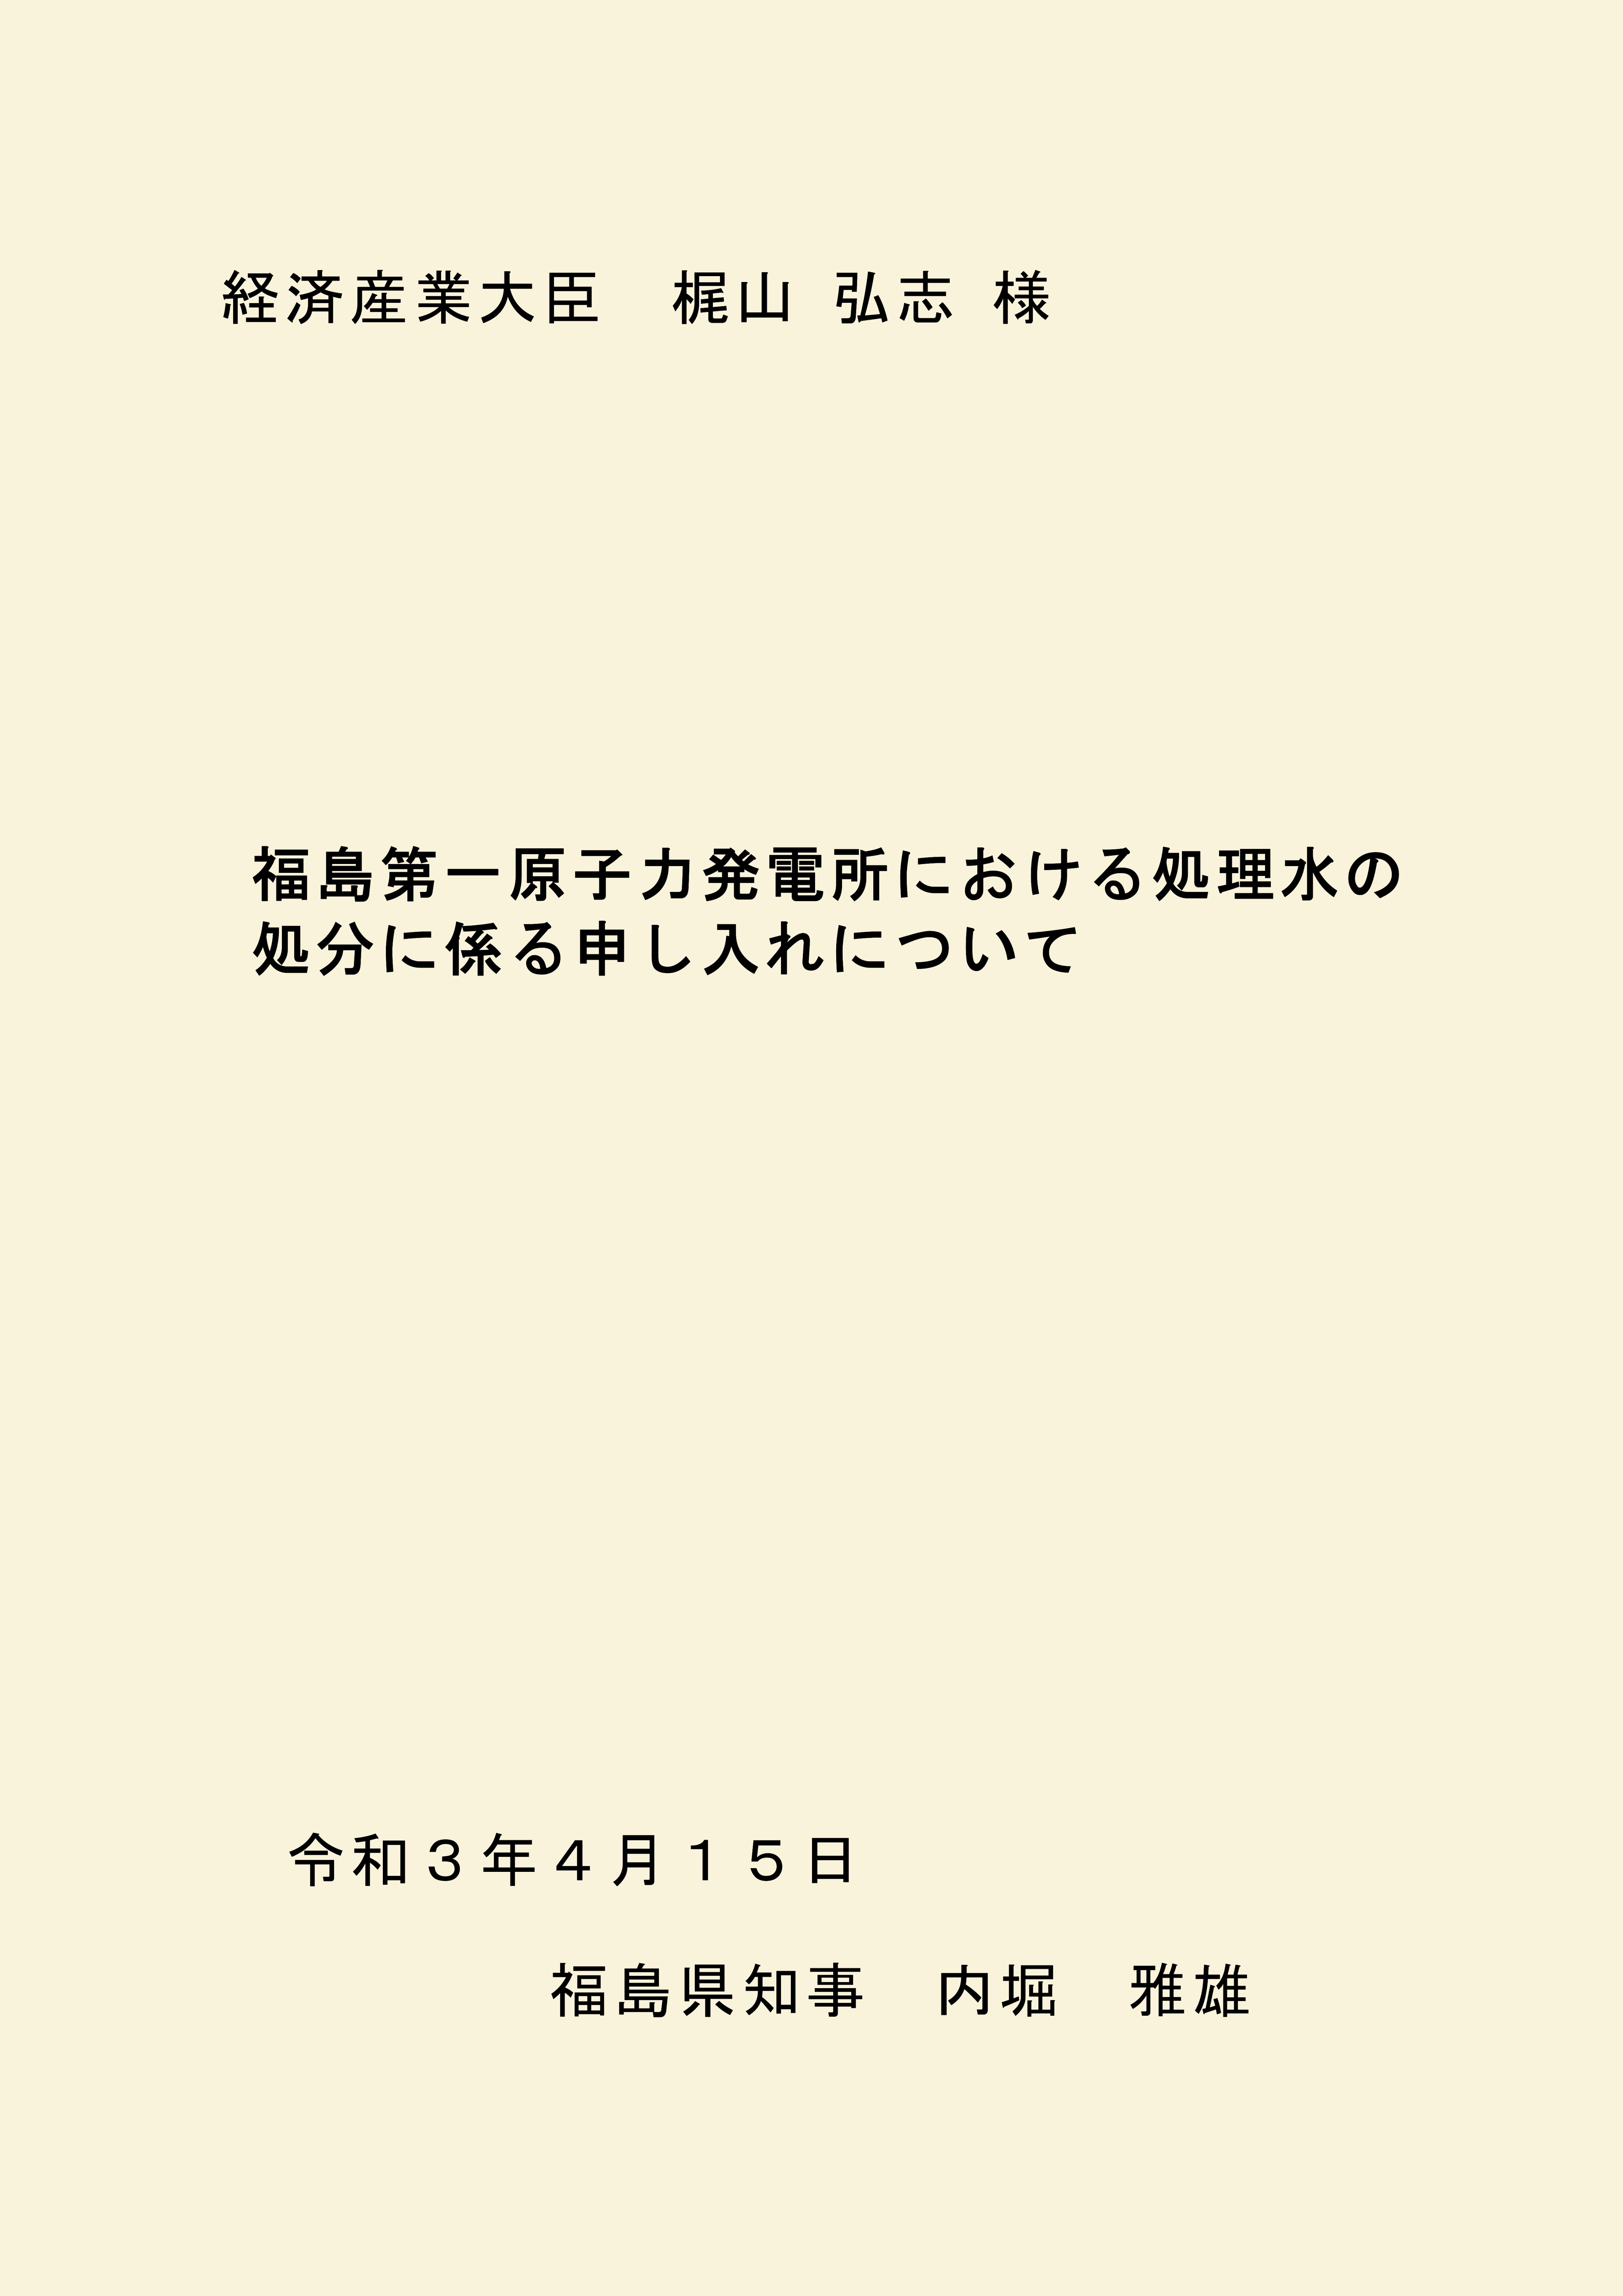 2021041519034803a.jpg